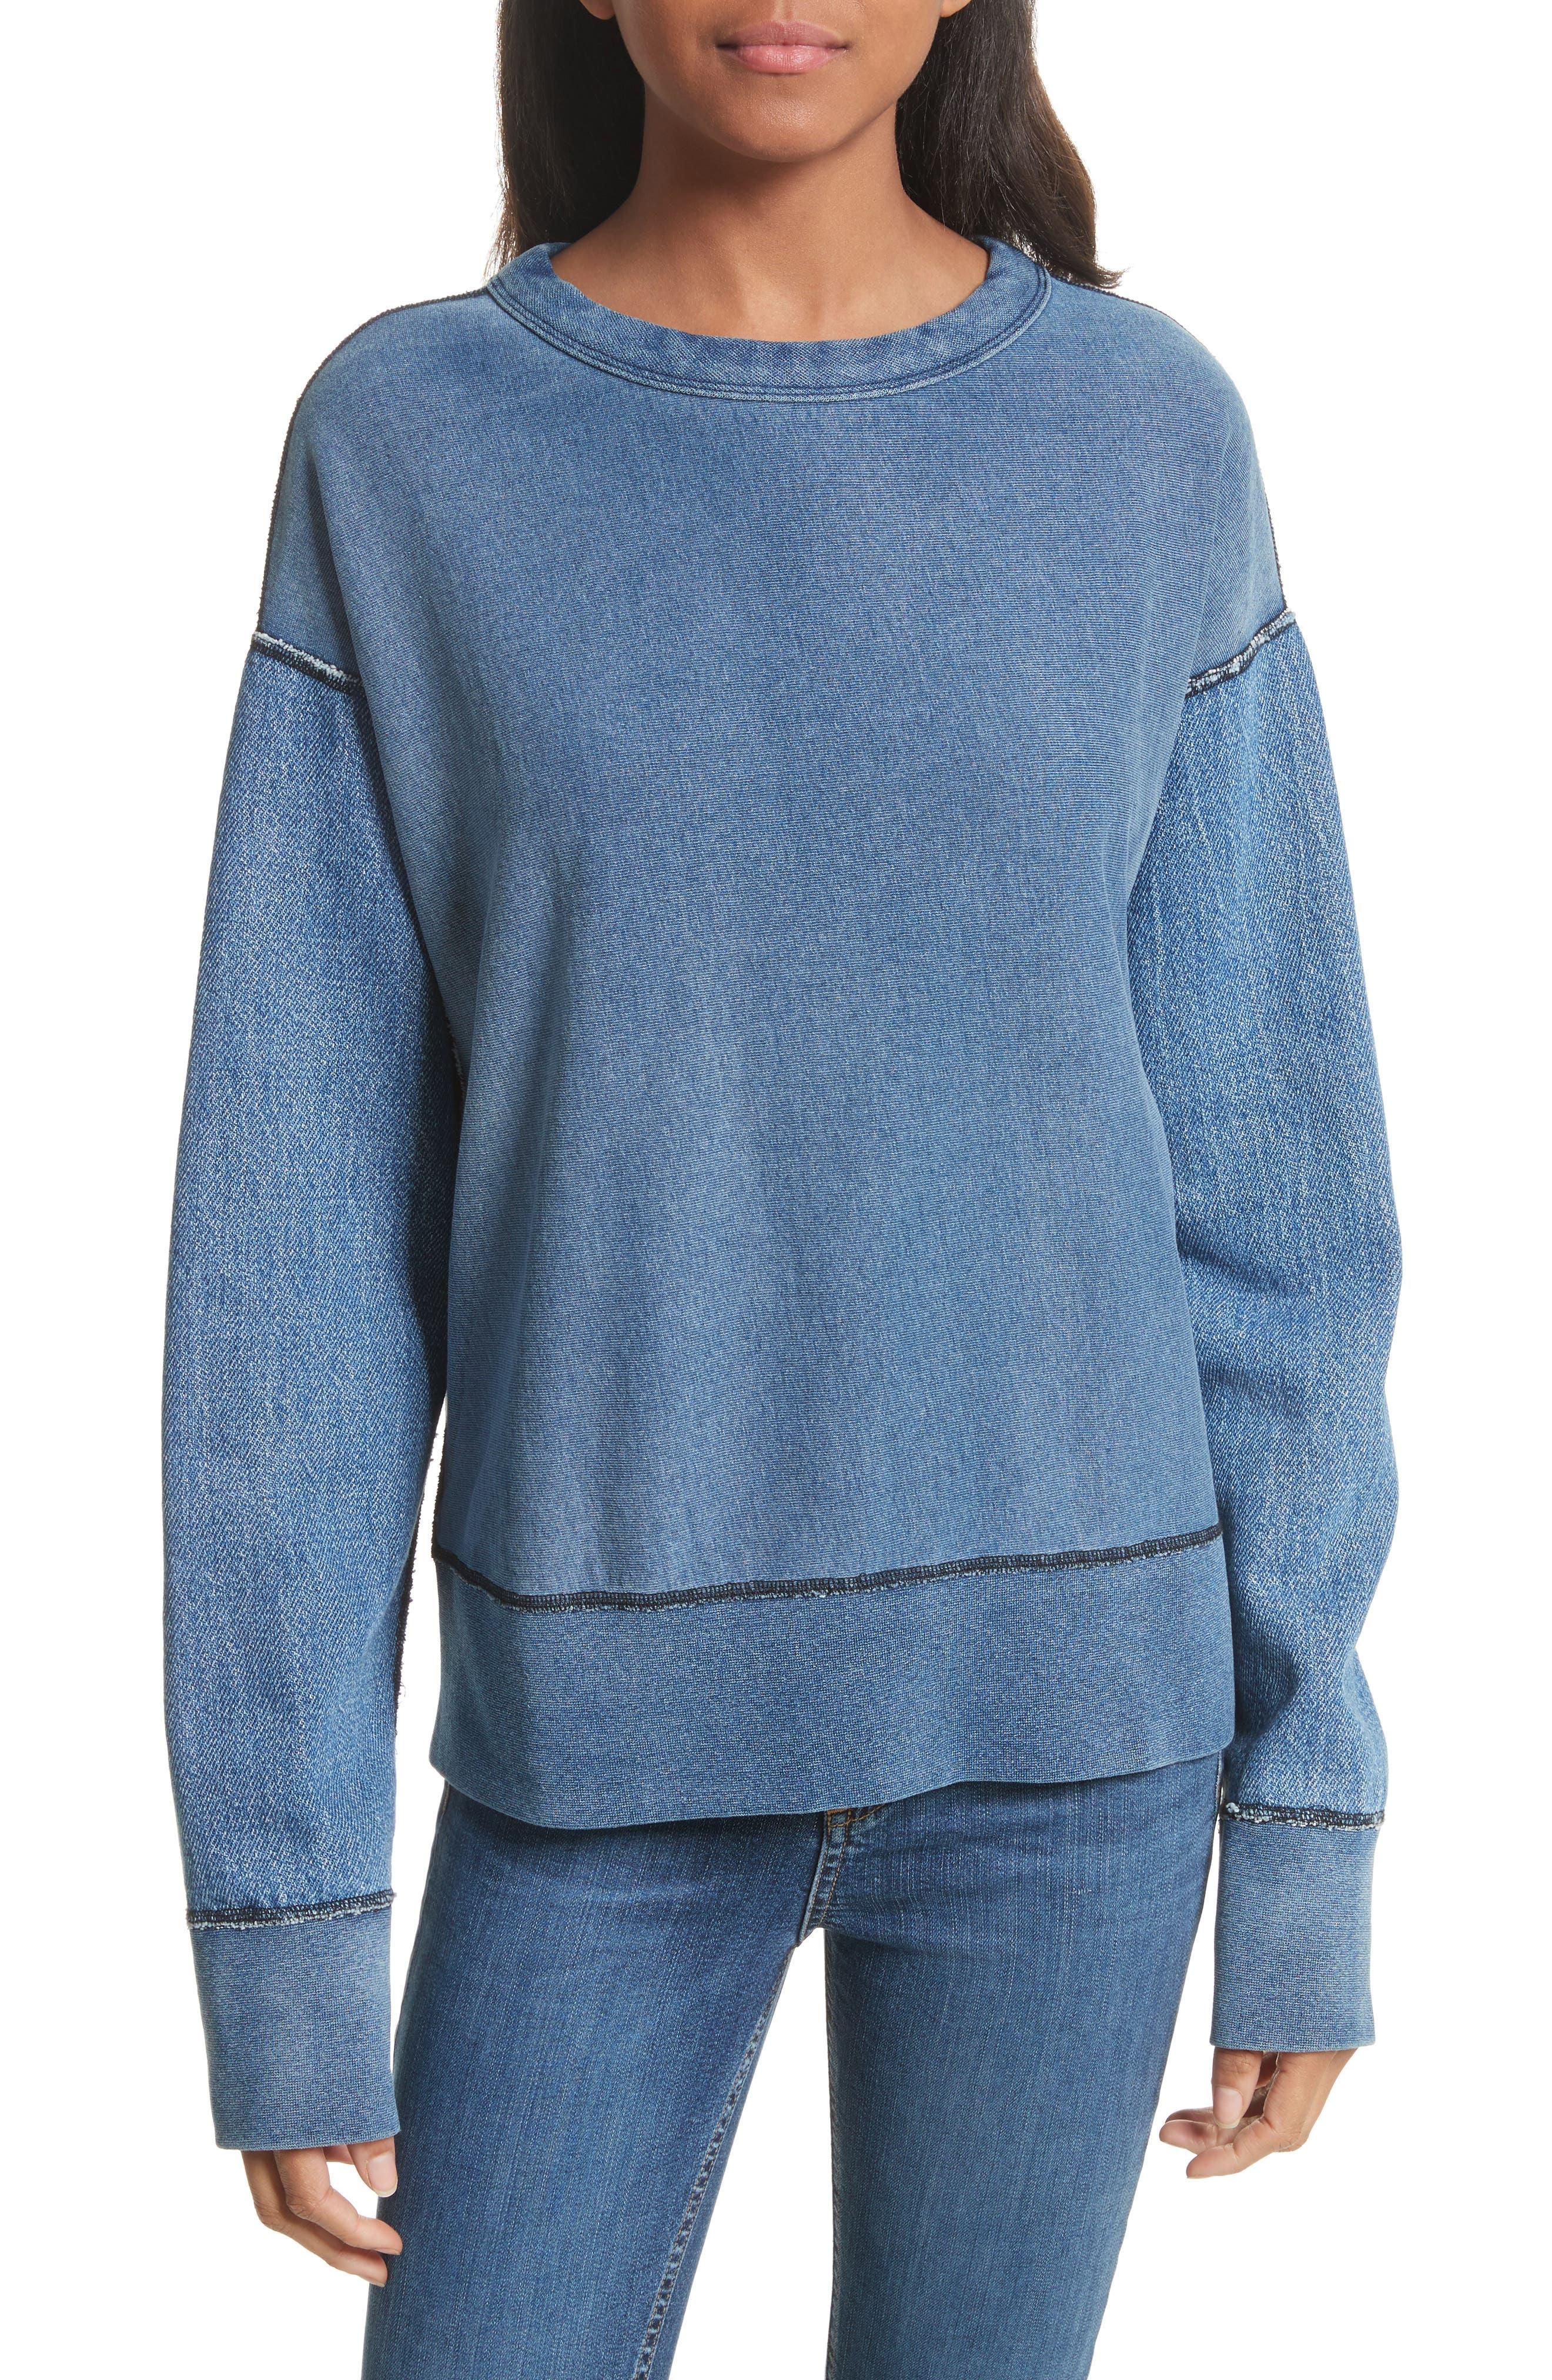 Alternate Image 1 Selected - rag & bone Indigo Baby Racer Sweatshirt